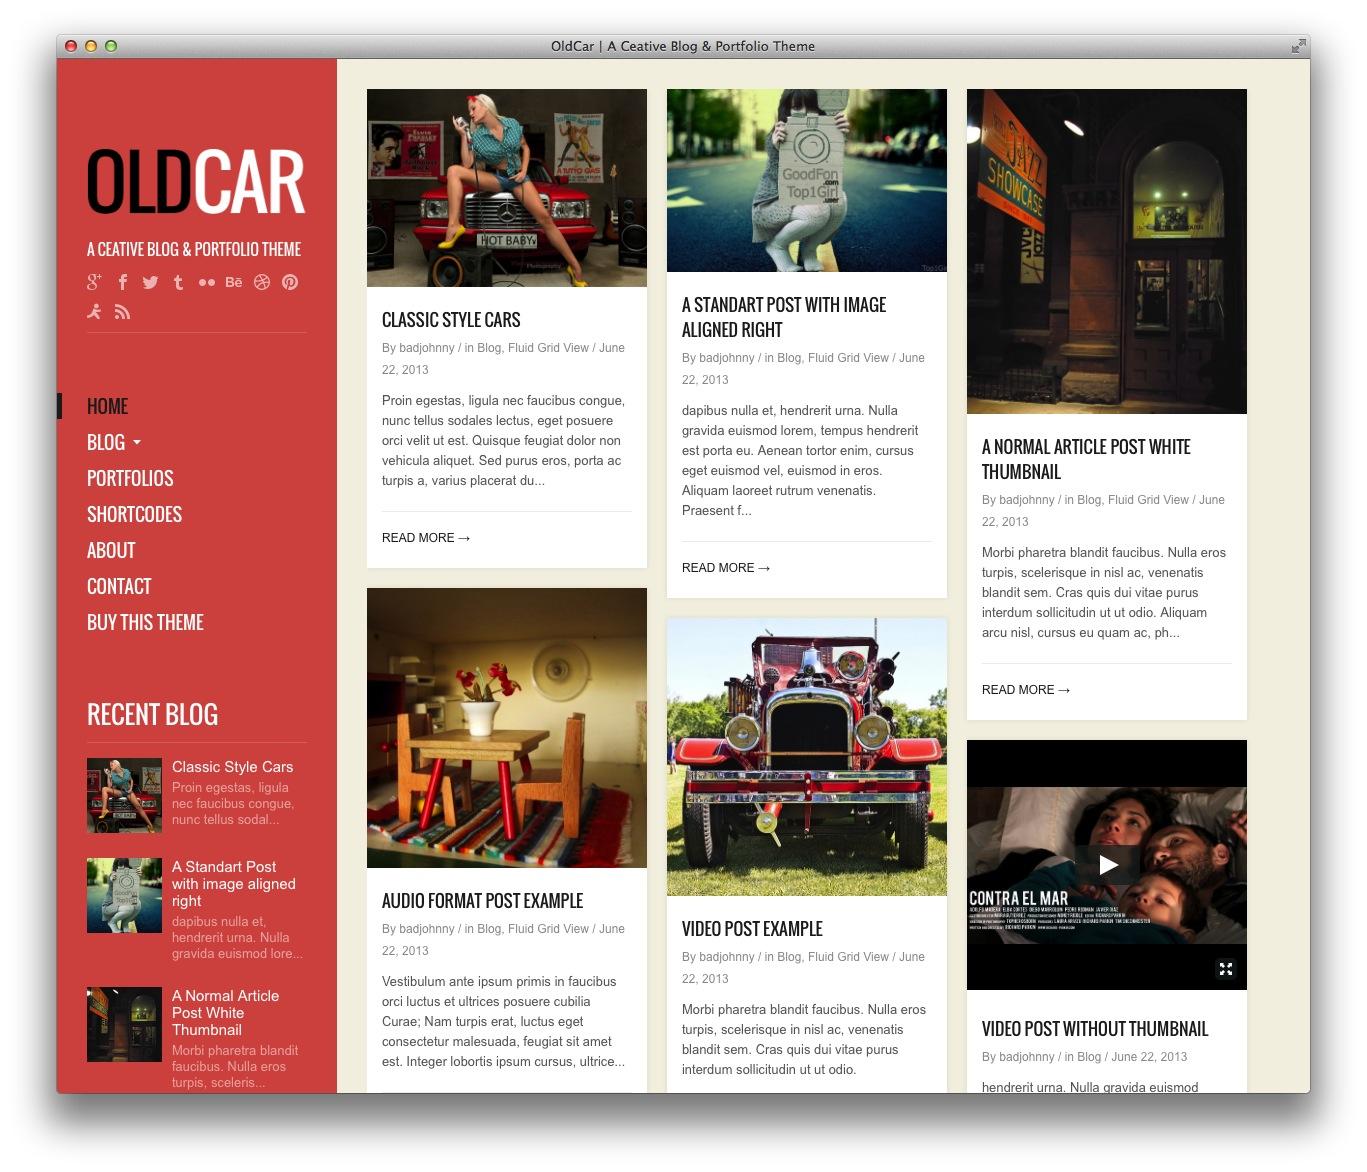 Attractive Tumblr Themes For Wordpress Illustration - Resume Ideas ...